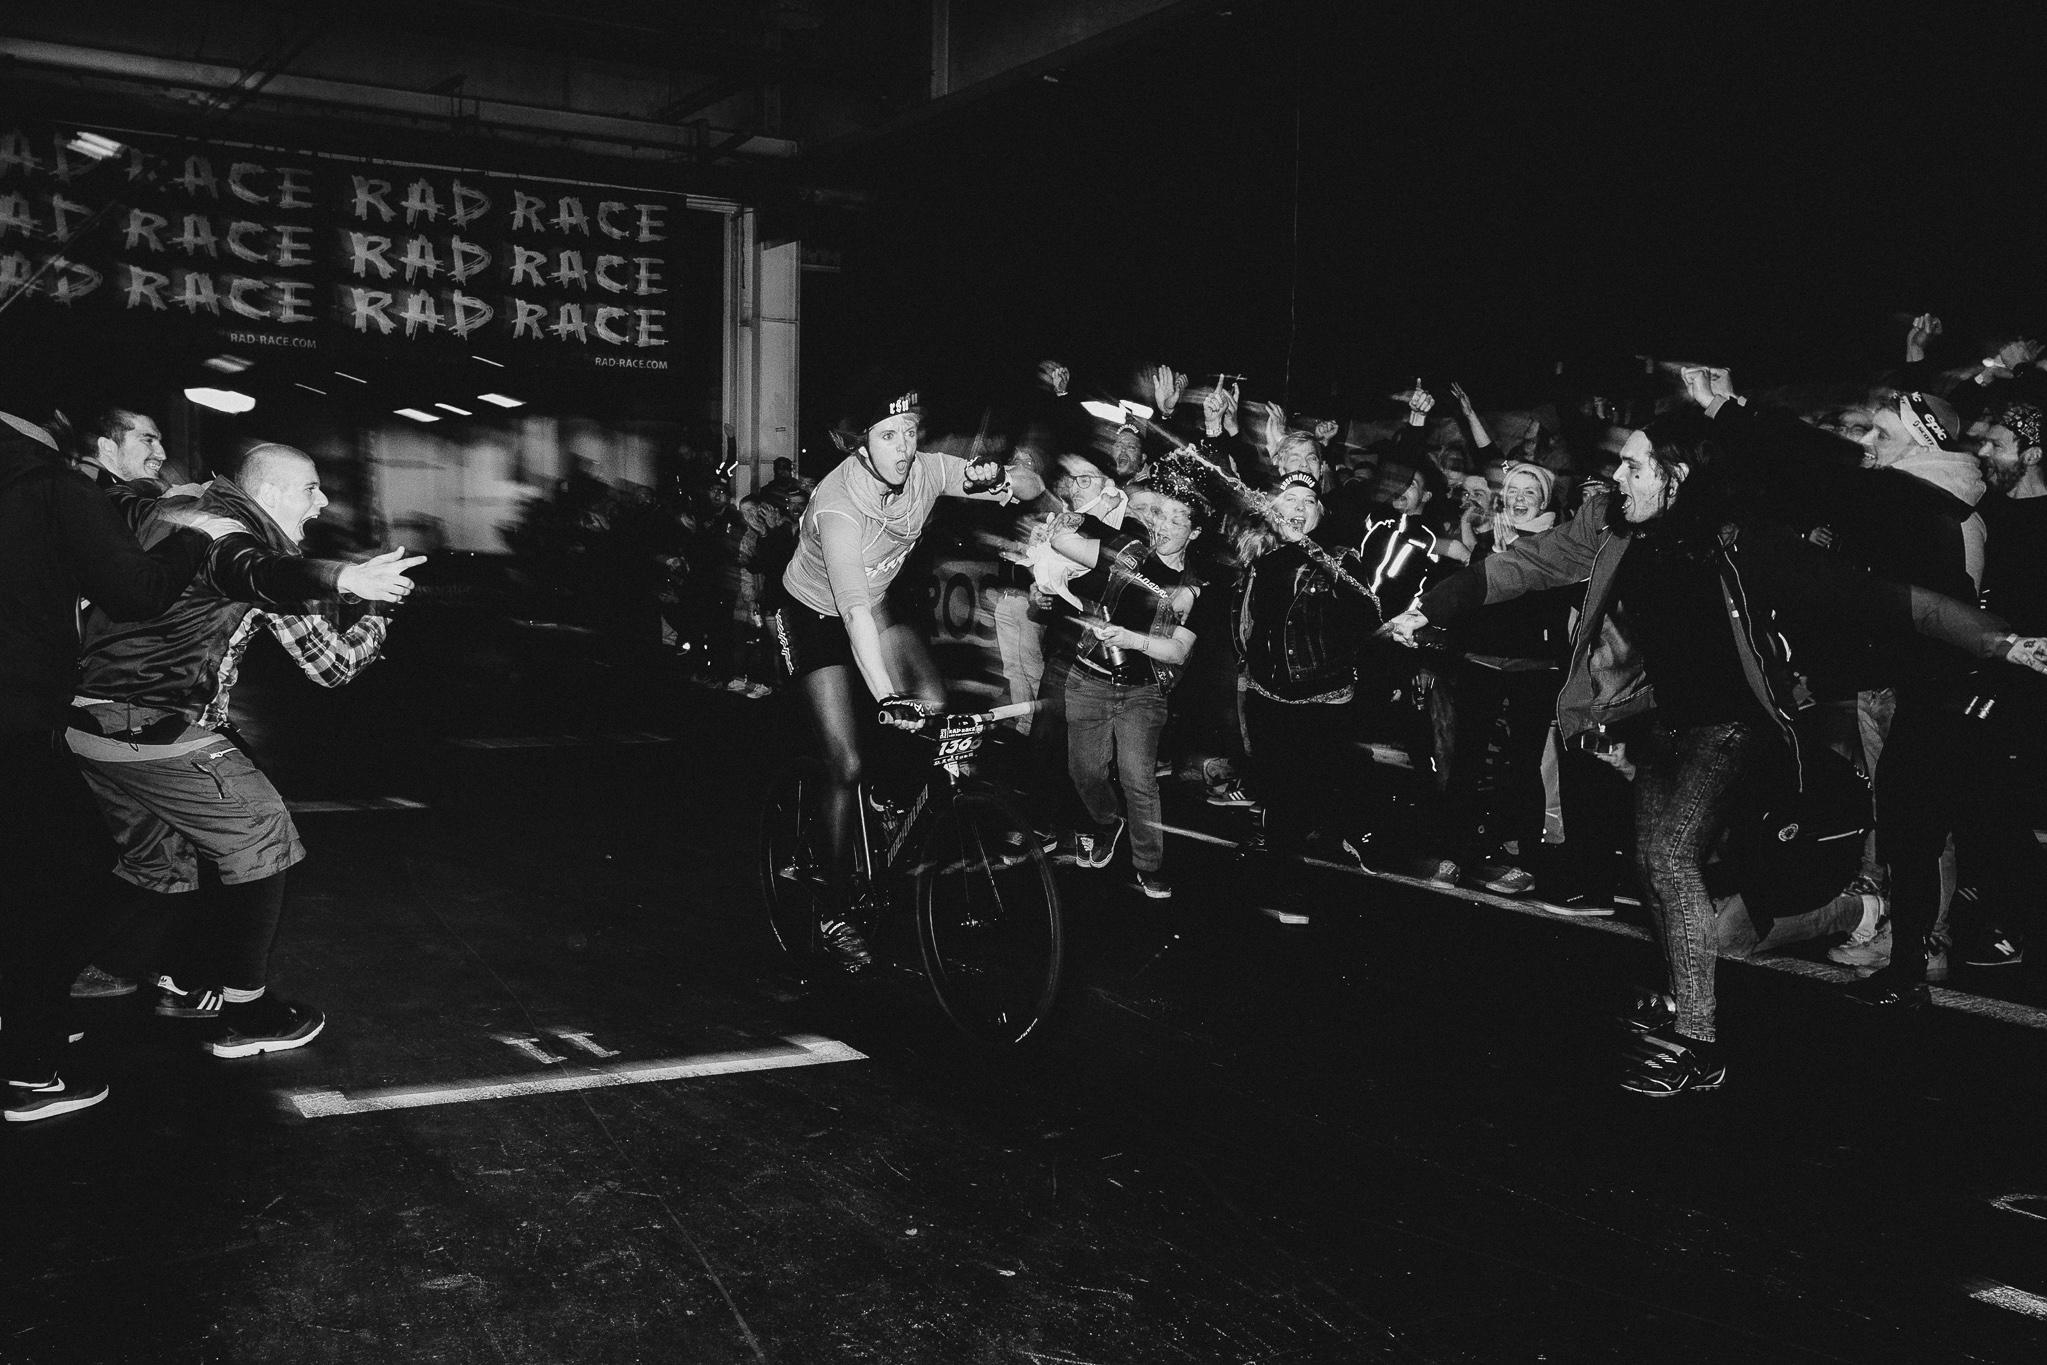 Last Woman StandinG: Marion Dzwinik // Radsportgruppe Ungemütlich